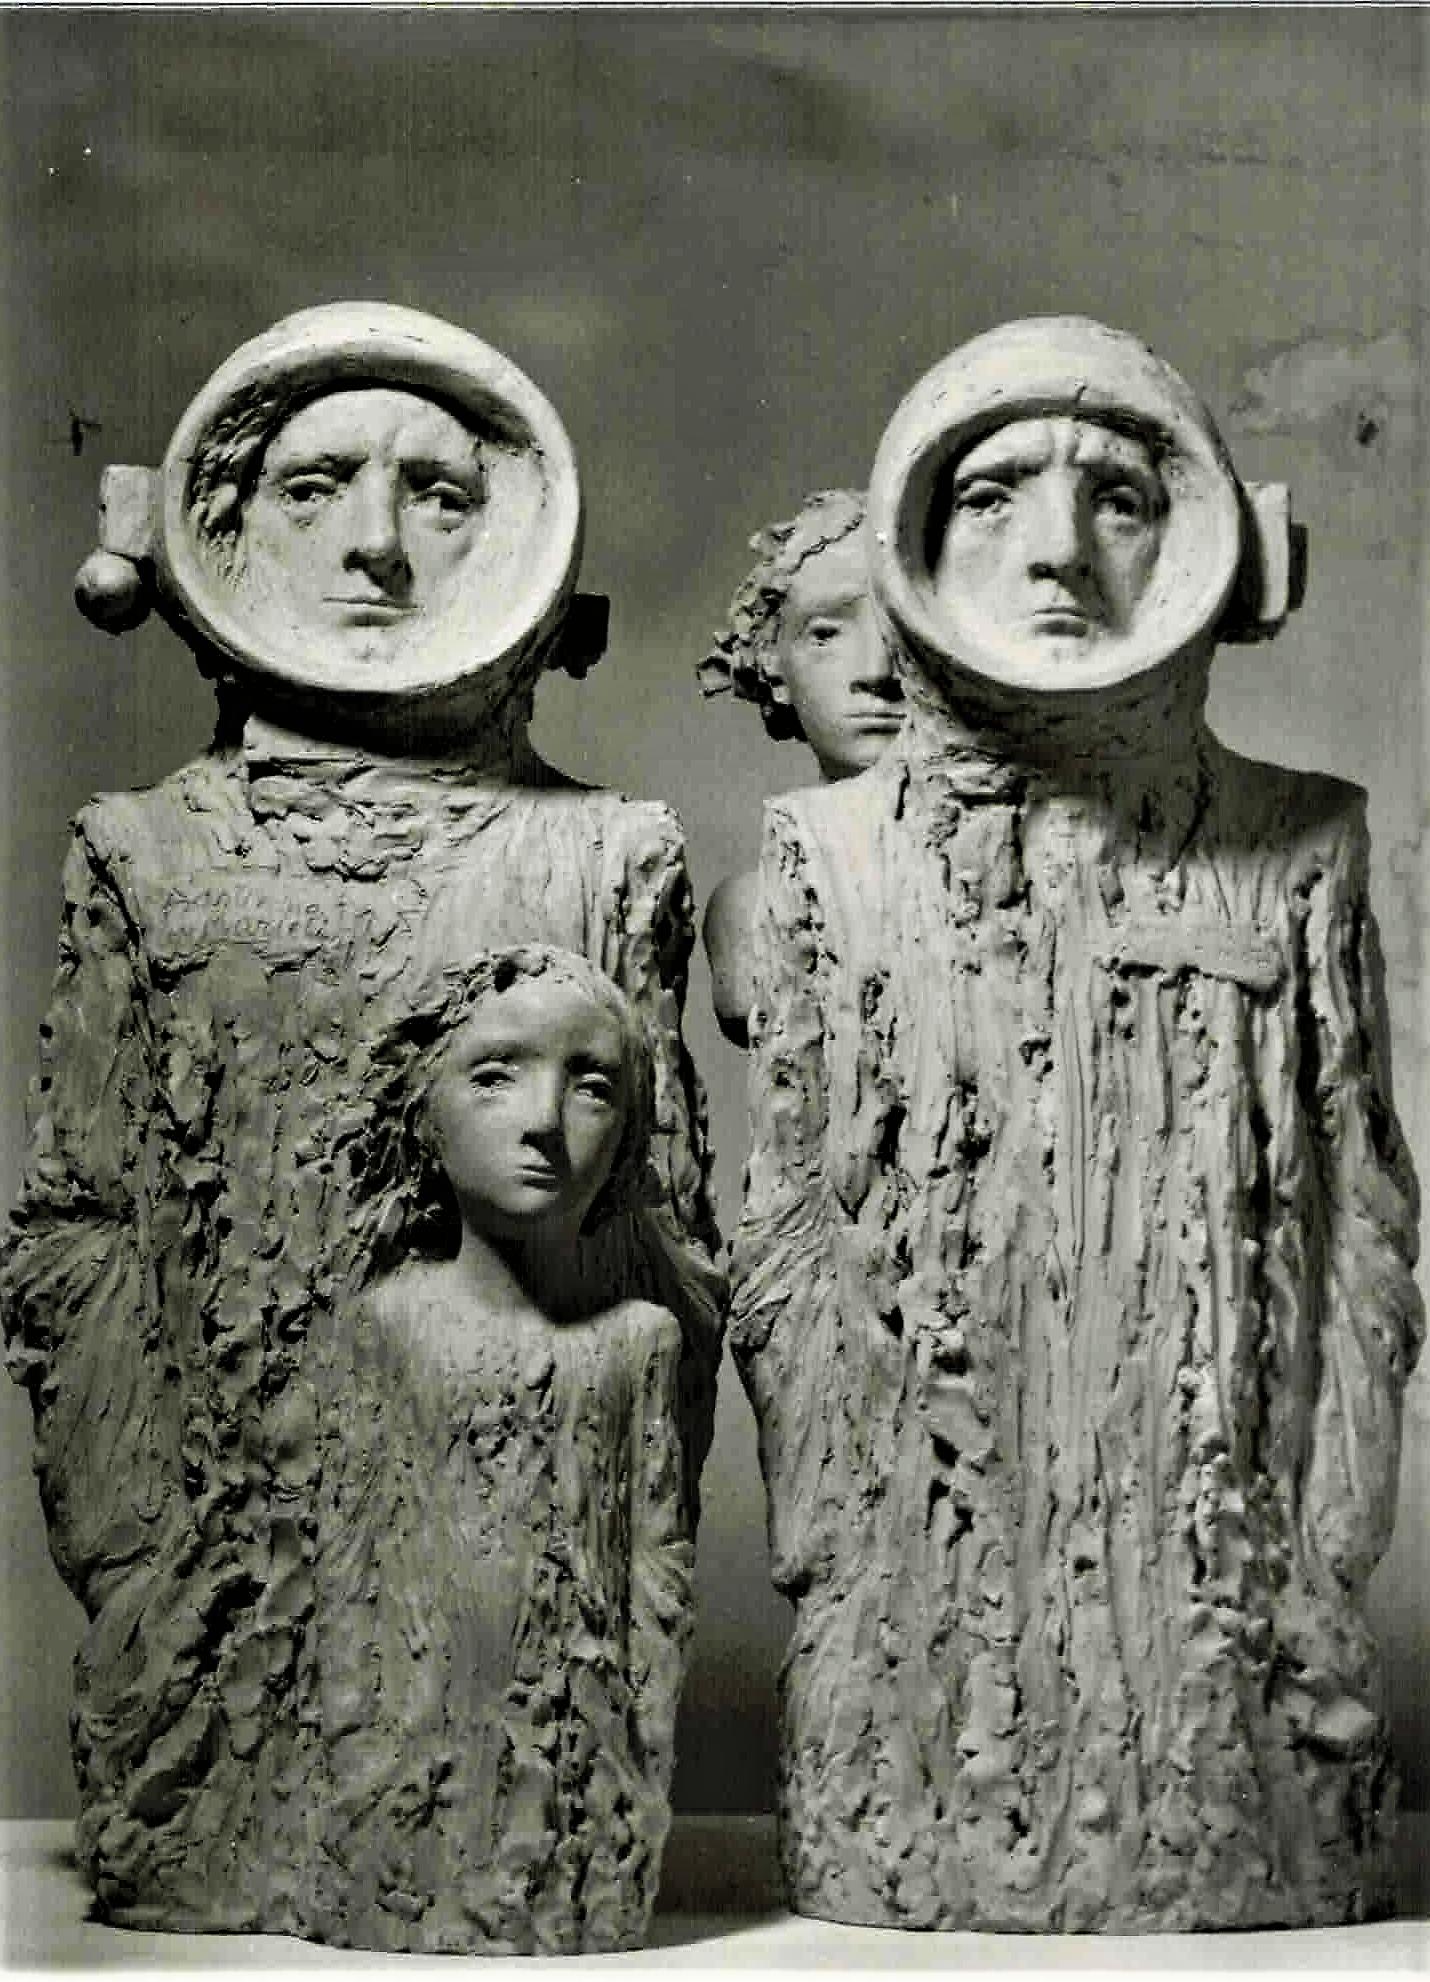 Astronautas: Astronauta con niño guardián y Astronauta con niña.